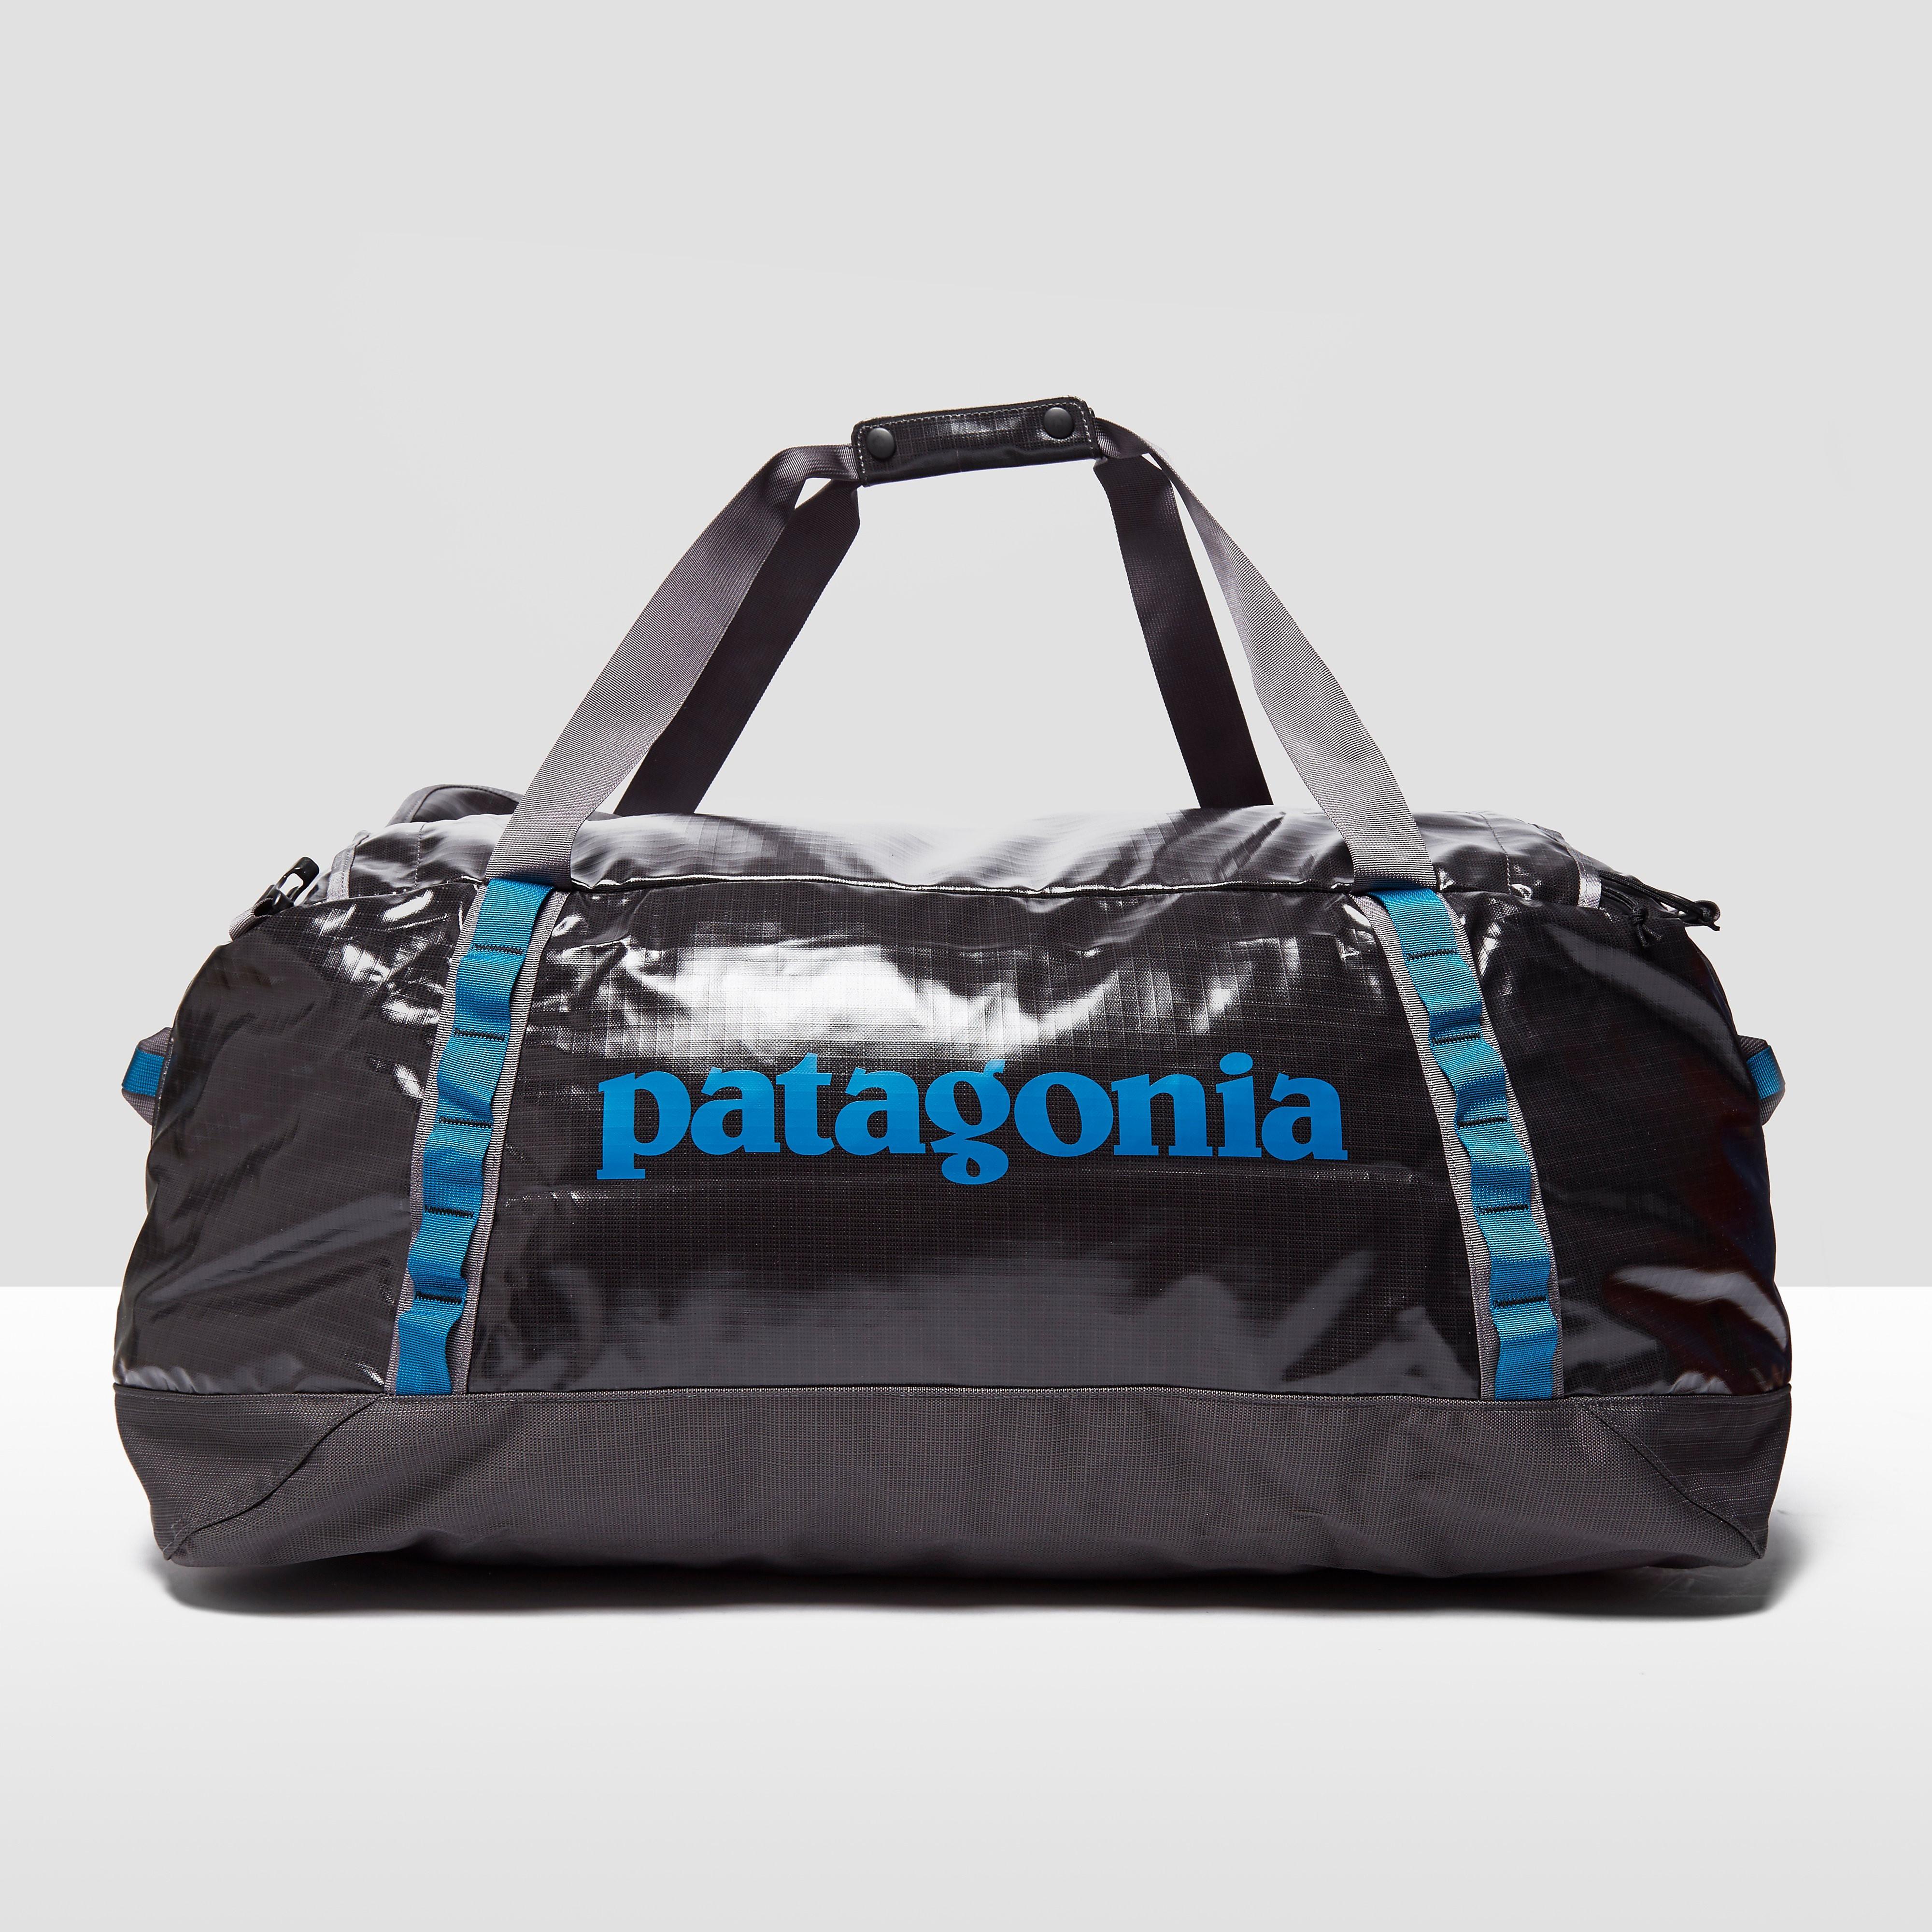 Patagonia Black Hole 60L Duffel Bag